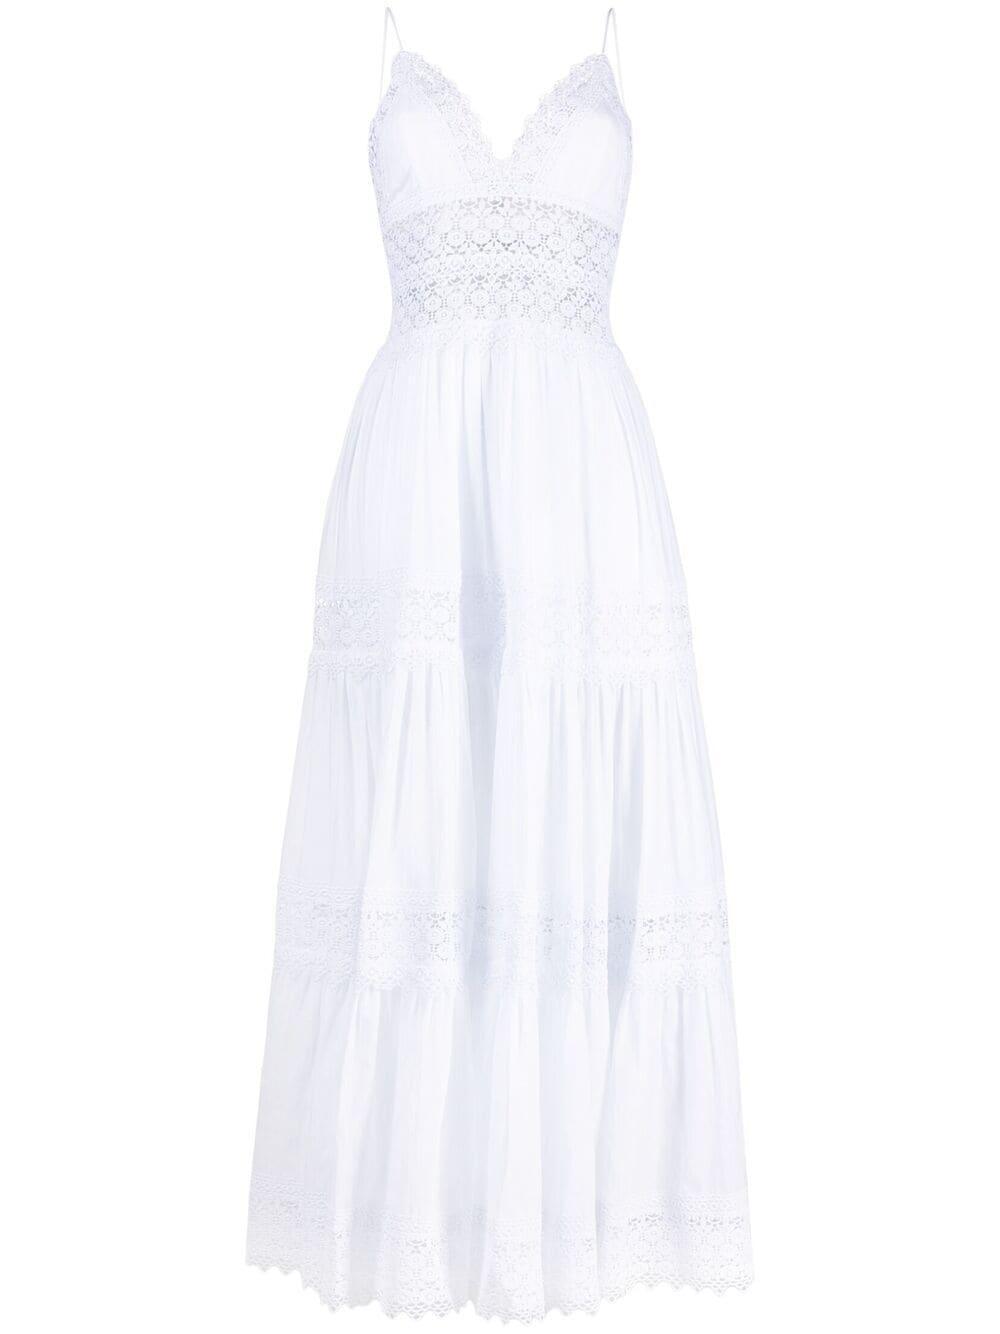 Cindy Maxi Dress